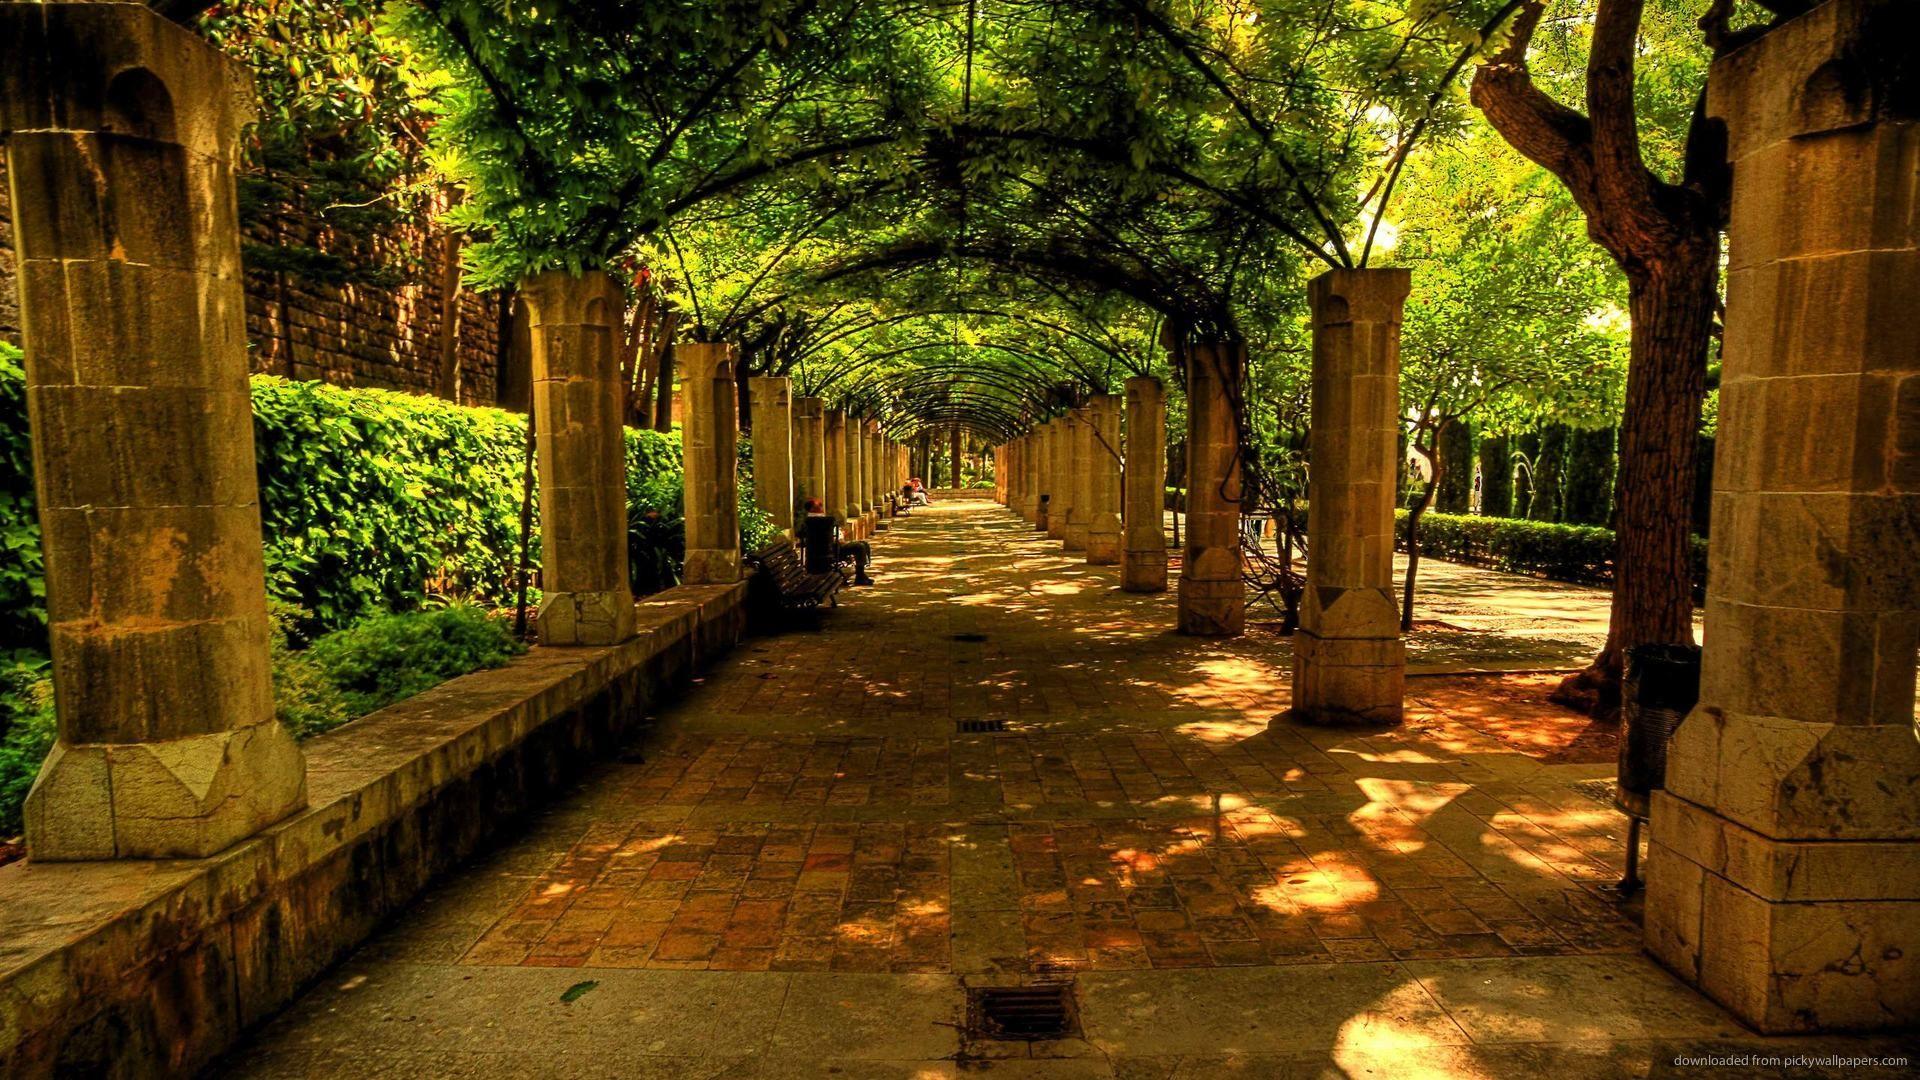 Hd Beautiful Alley In Spain Wallpaper Dream Vacation Spots Beautiful Places Green Landscape